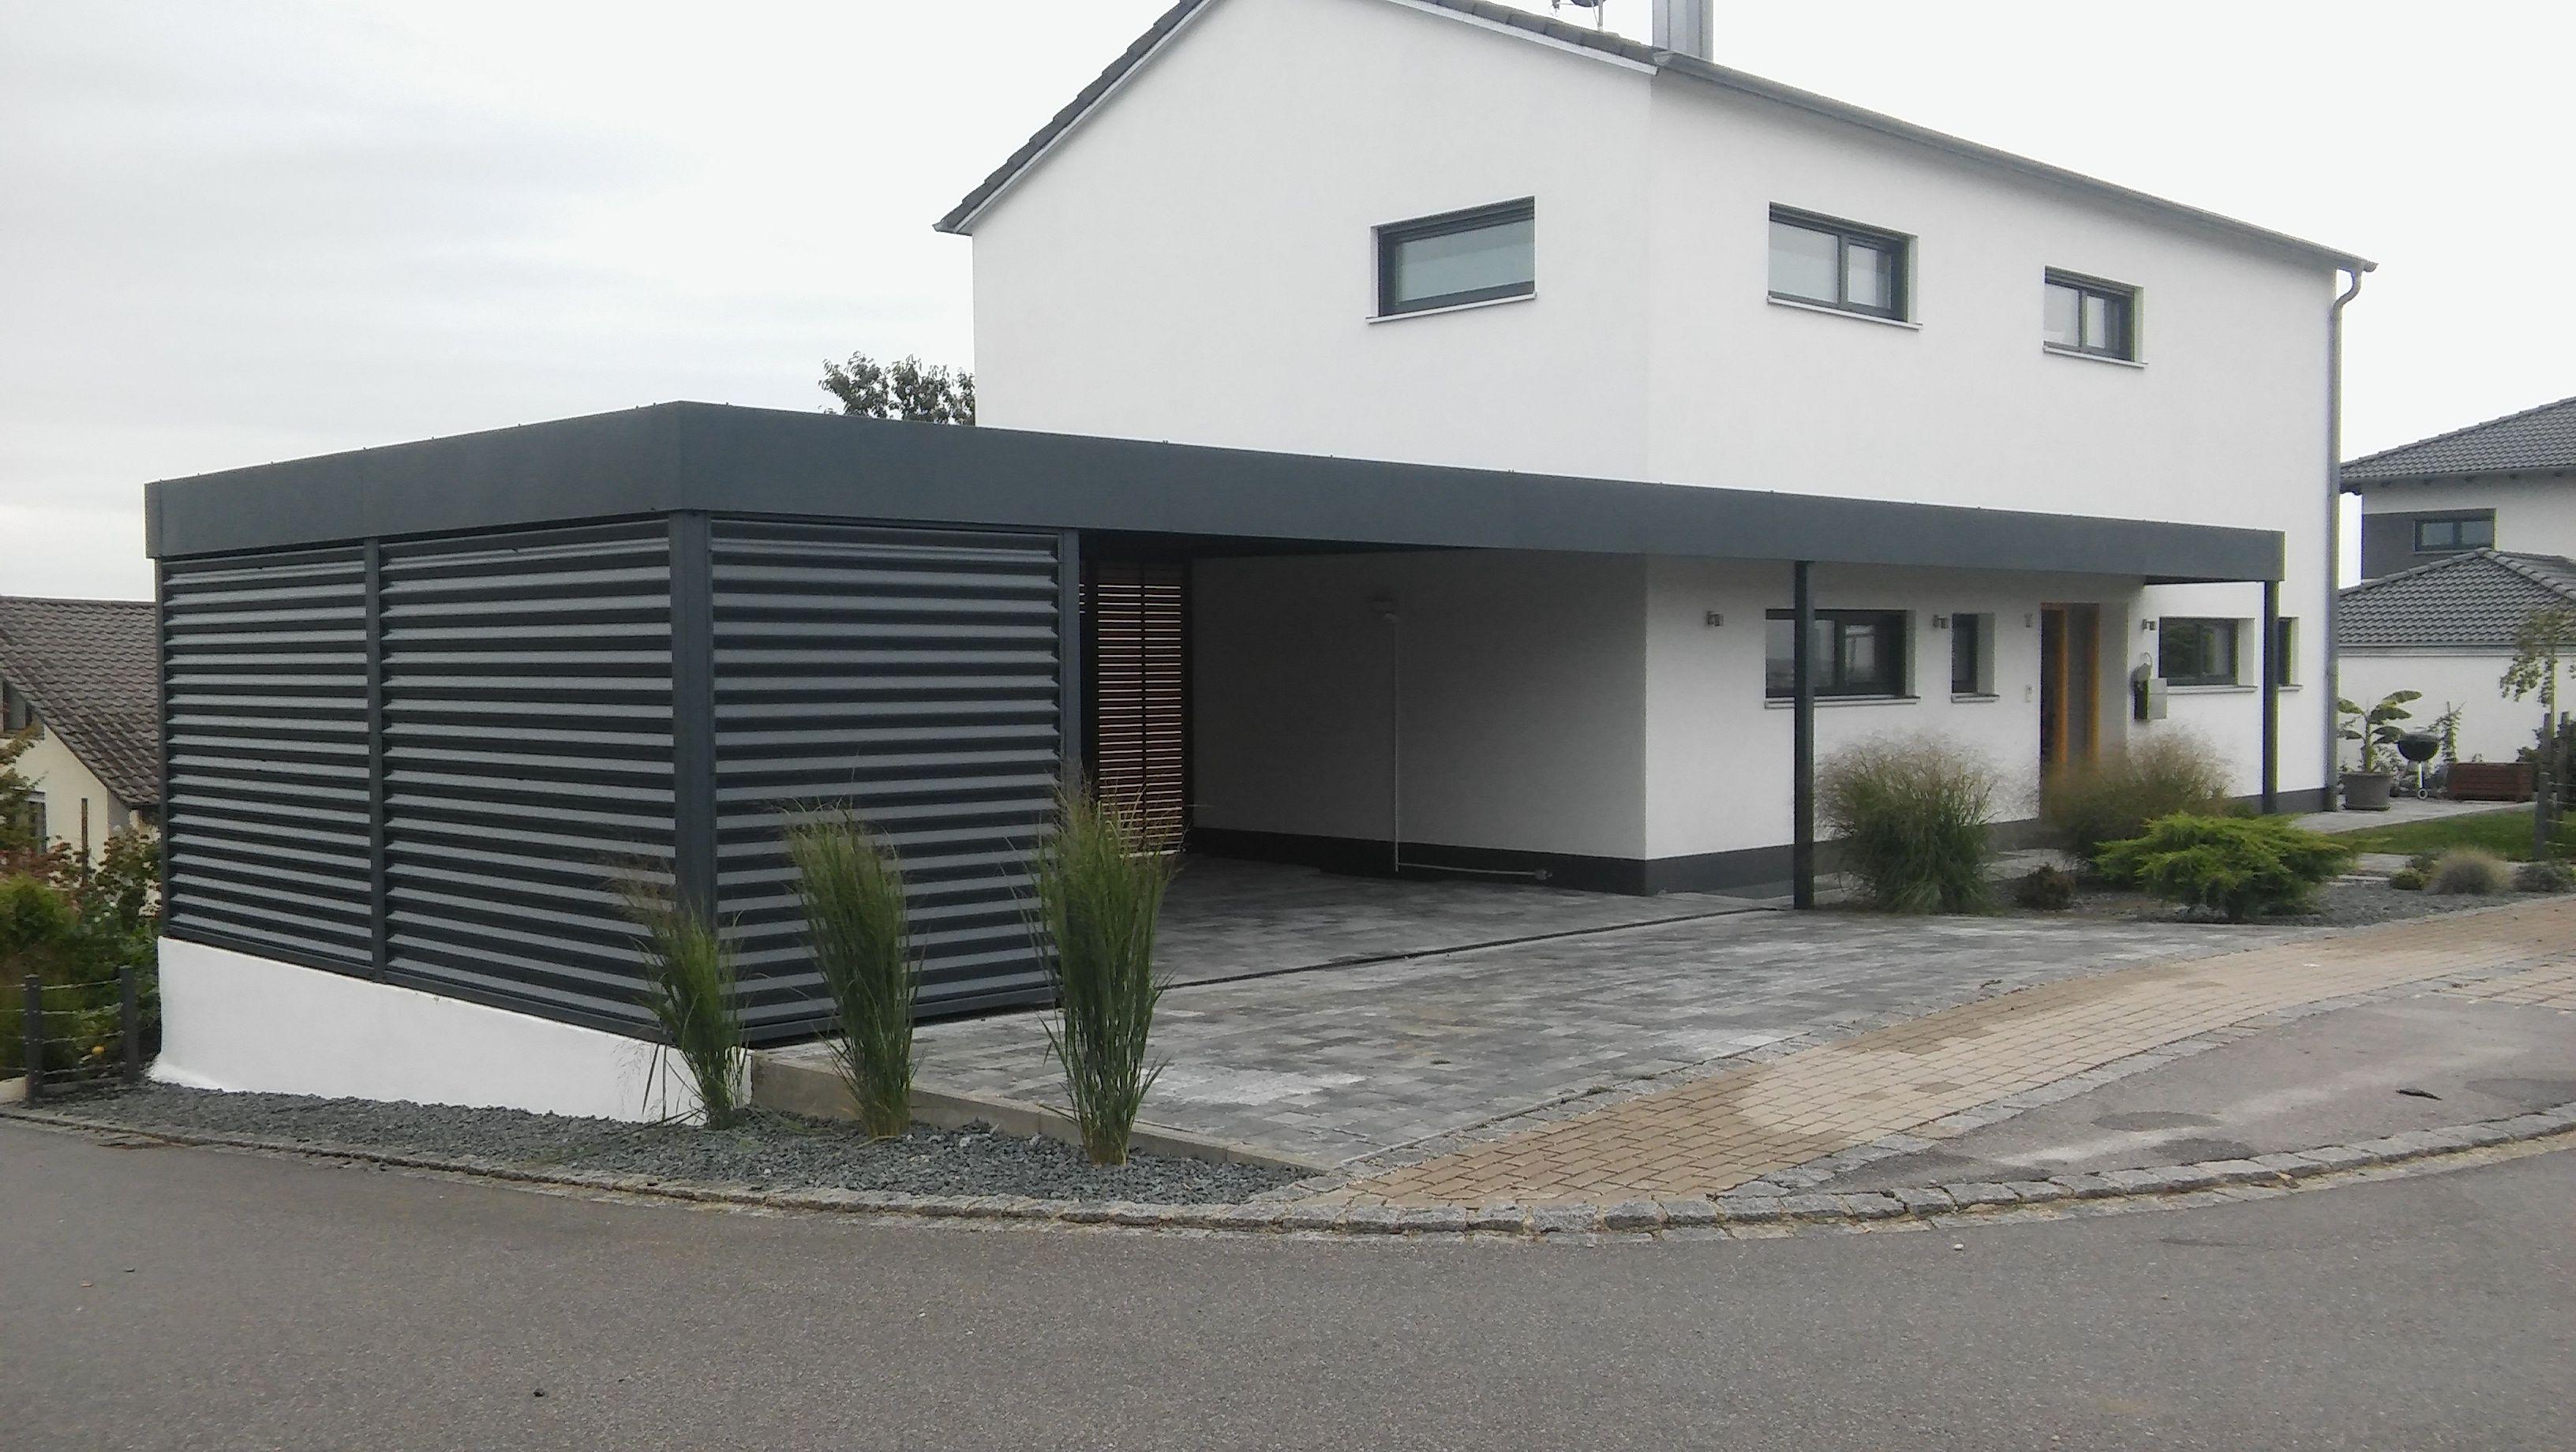 moderne carports in 2019 architecture carport. Black Bedroom Furniture Sets. Home Design Ideas